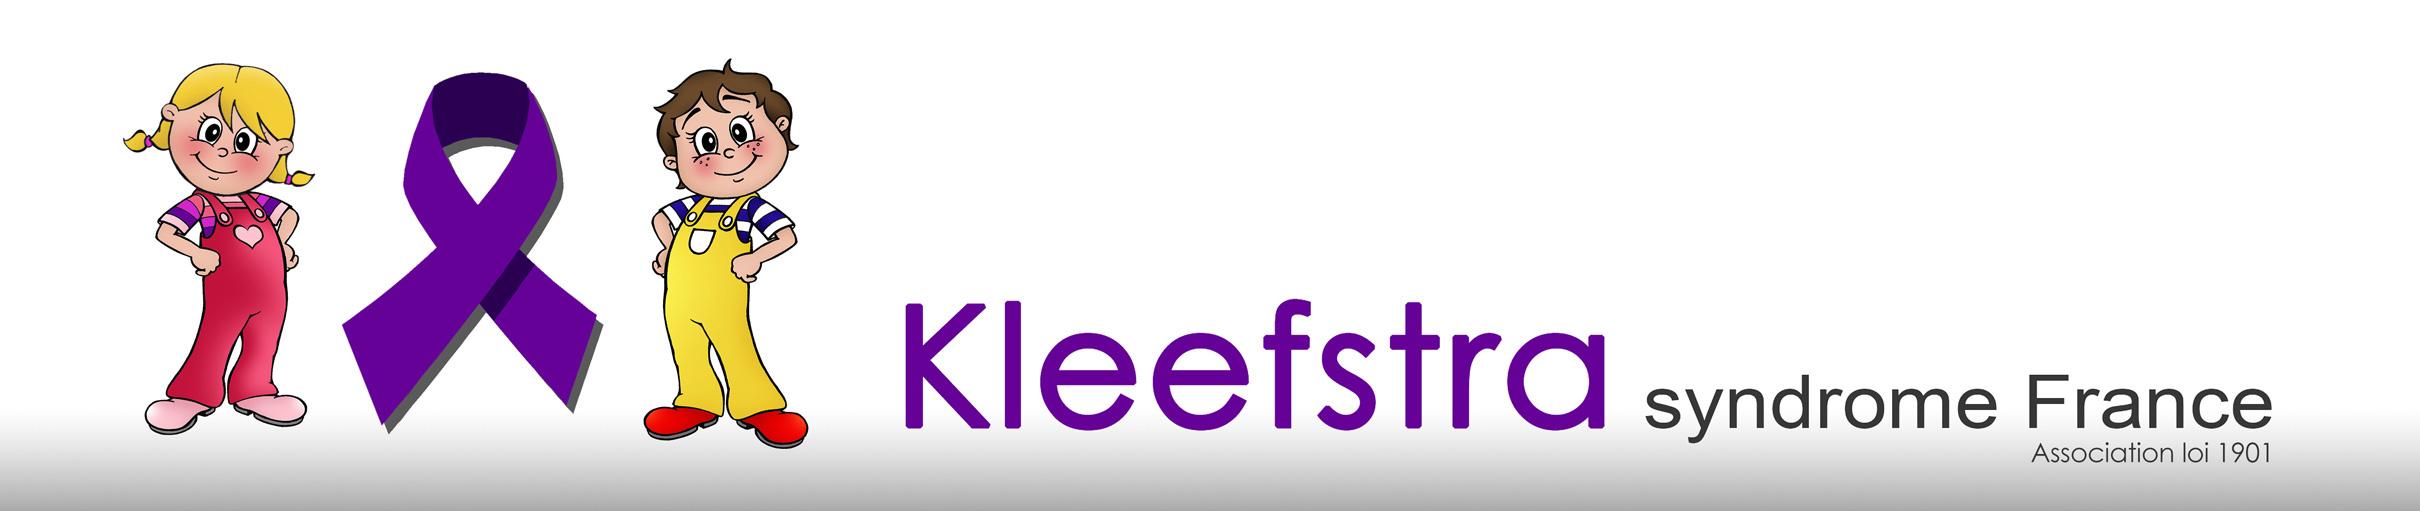 KLEEFSTRA SYNDROME FRANCE ASSOCIATION LOI 1901